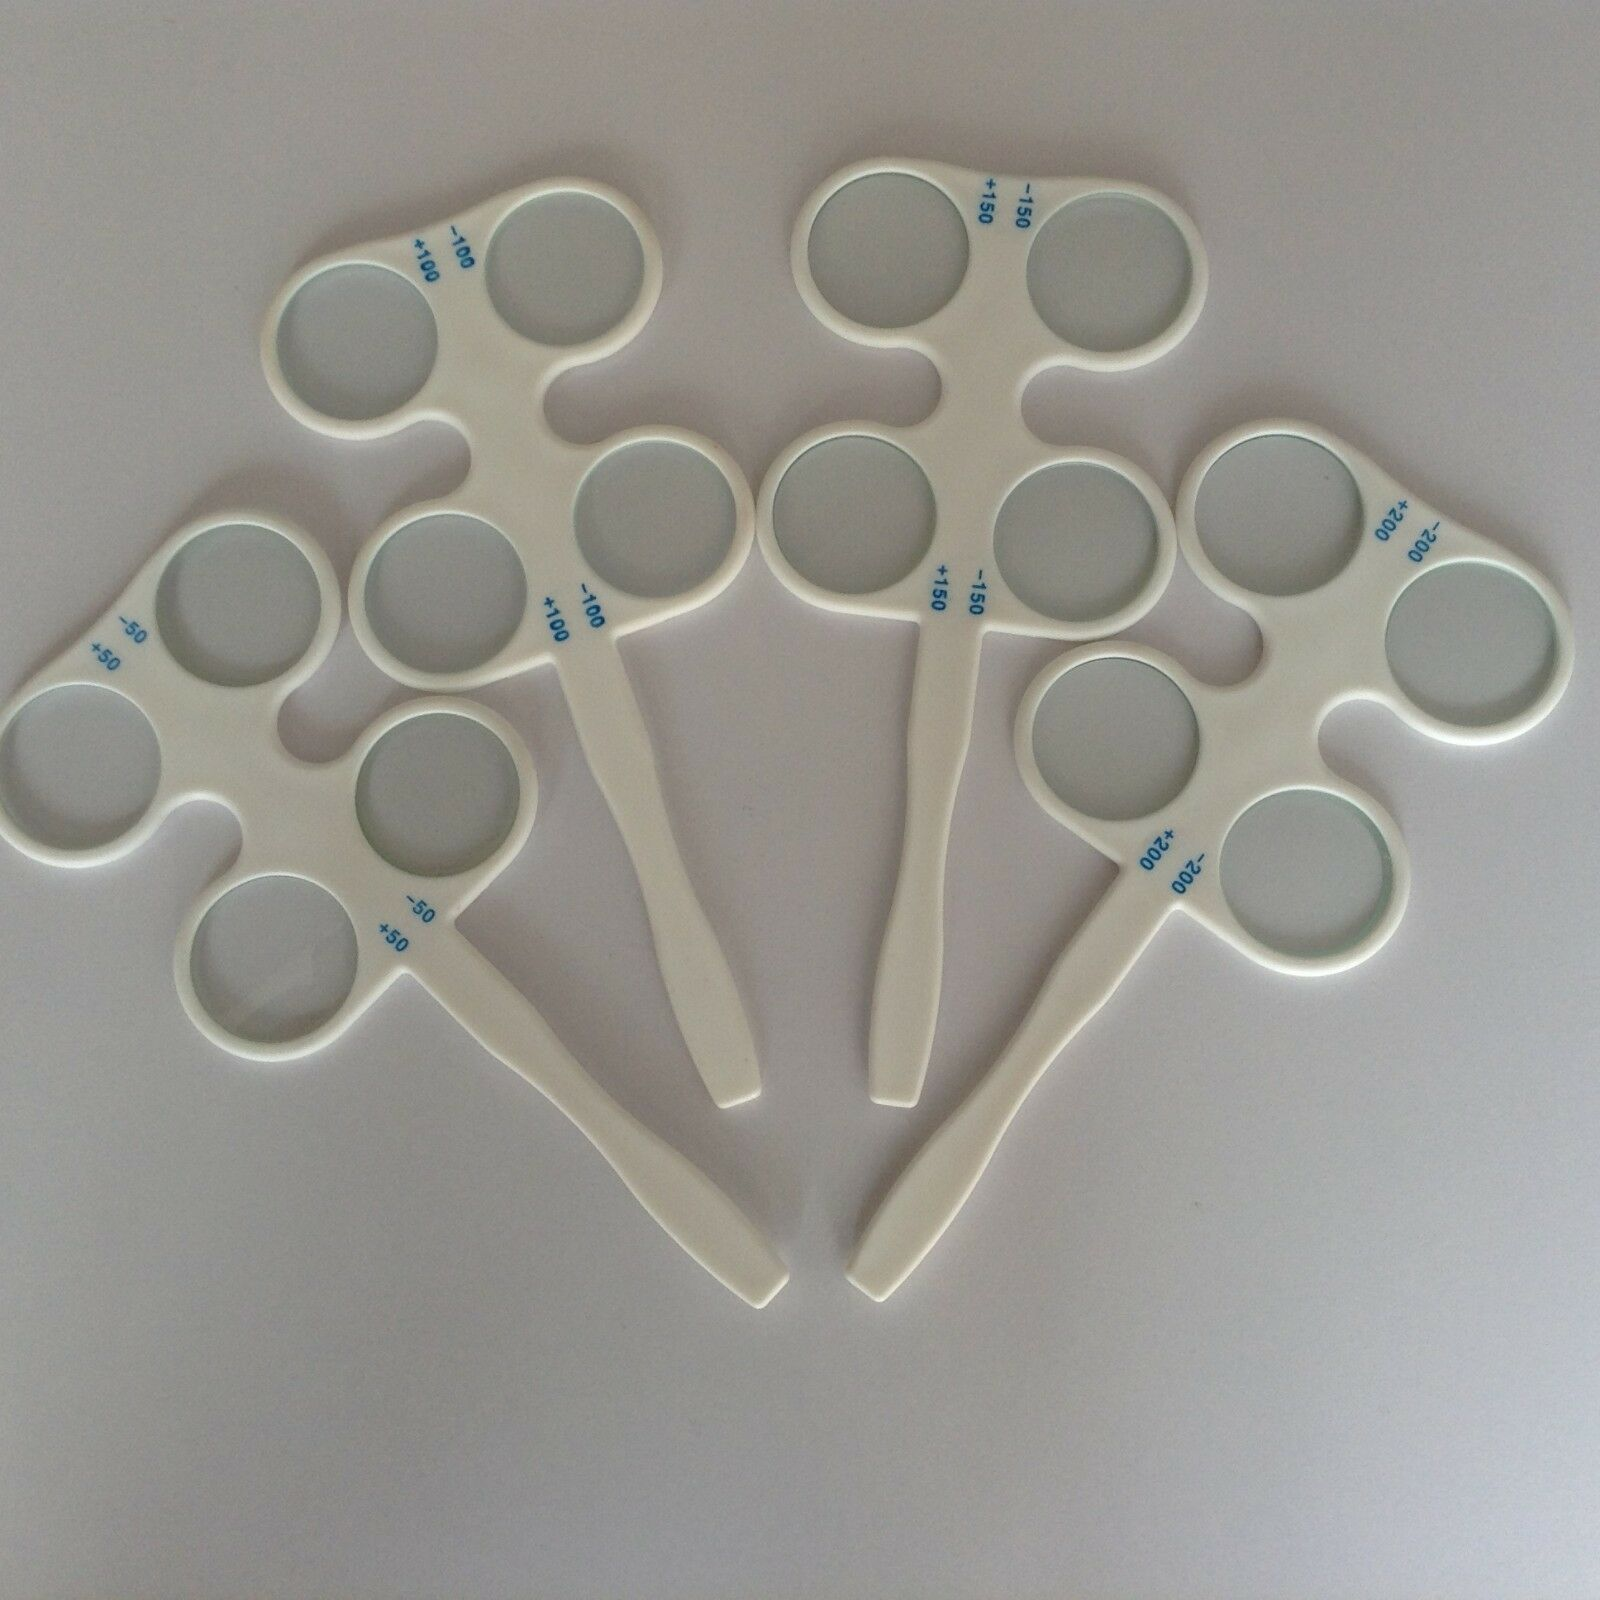 1pcs Multiple Sizes Amblyopia Trainer Confirmation Flipper Ophthalmic Flipper Optical Instruments Lens Flipper